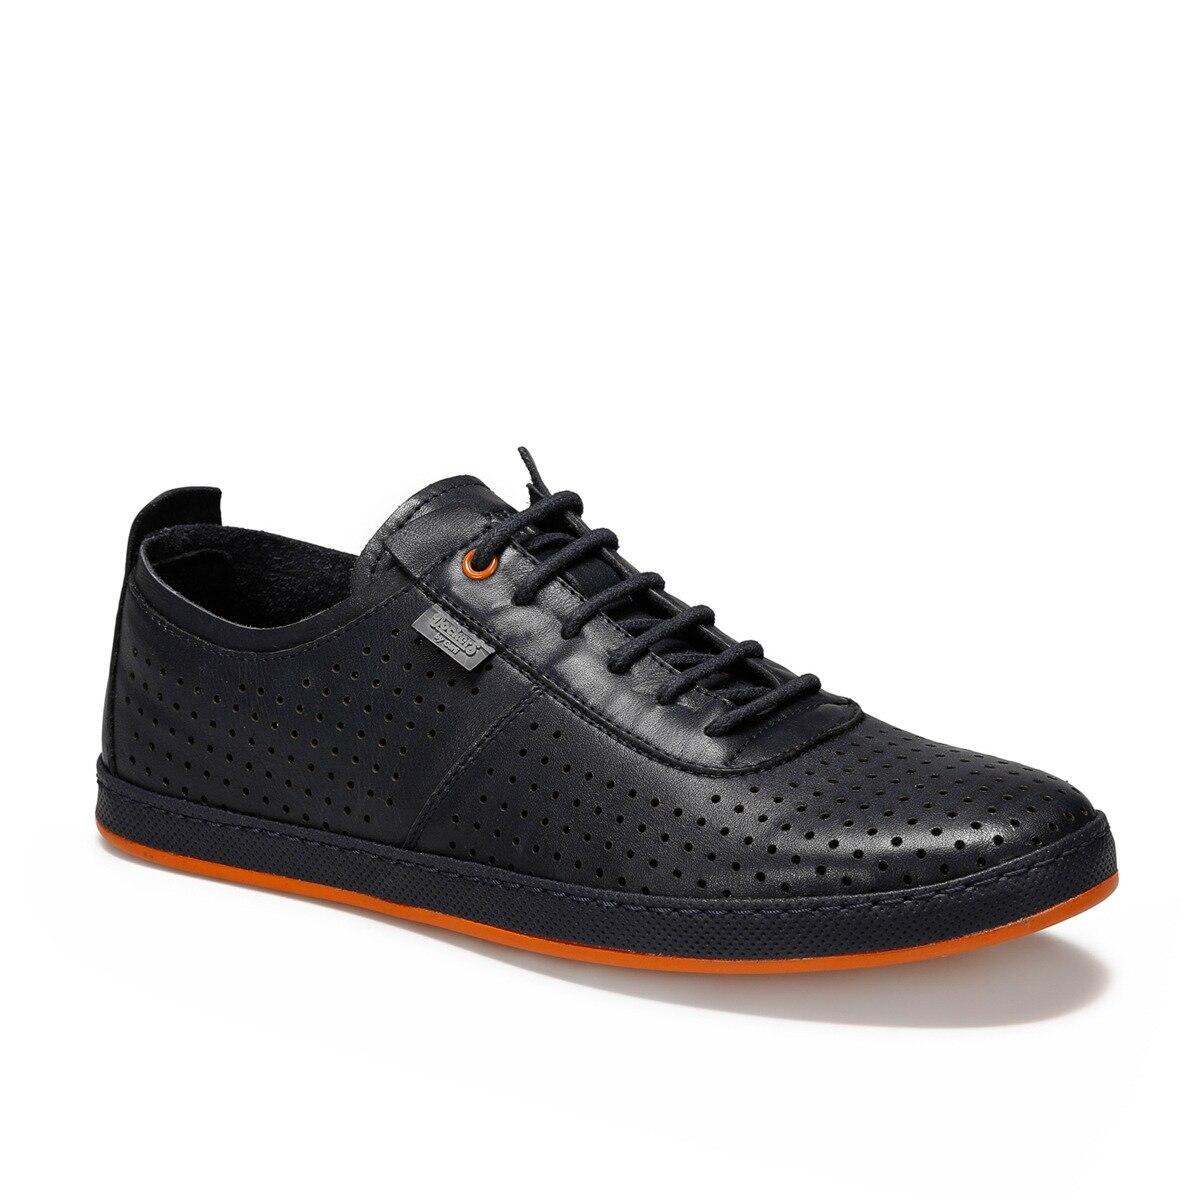 Flo 226201 sapatos de conforto masculino preto por dockers the gerle